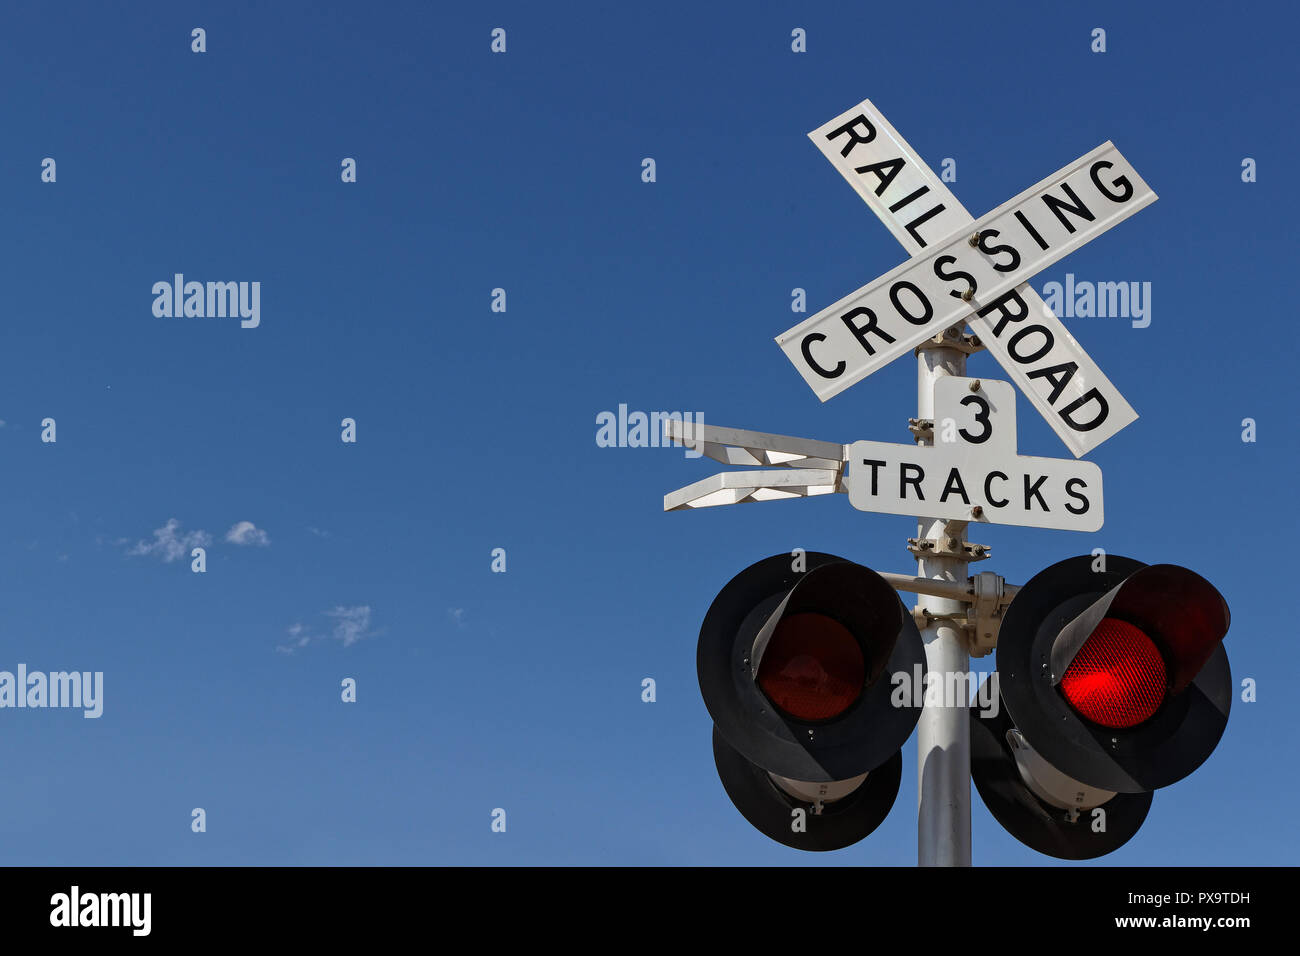 Railway crossing signalization - Stock Image